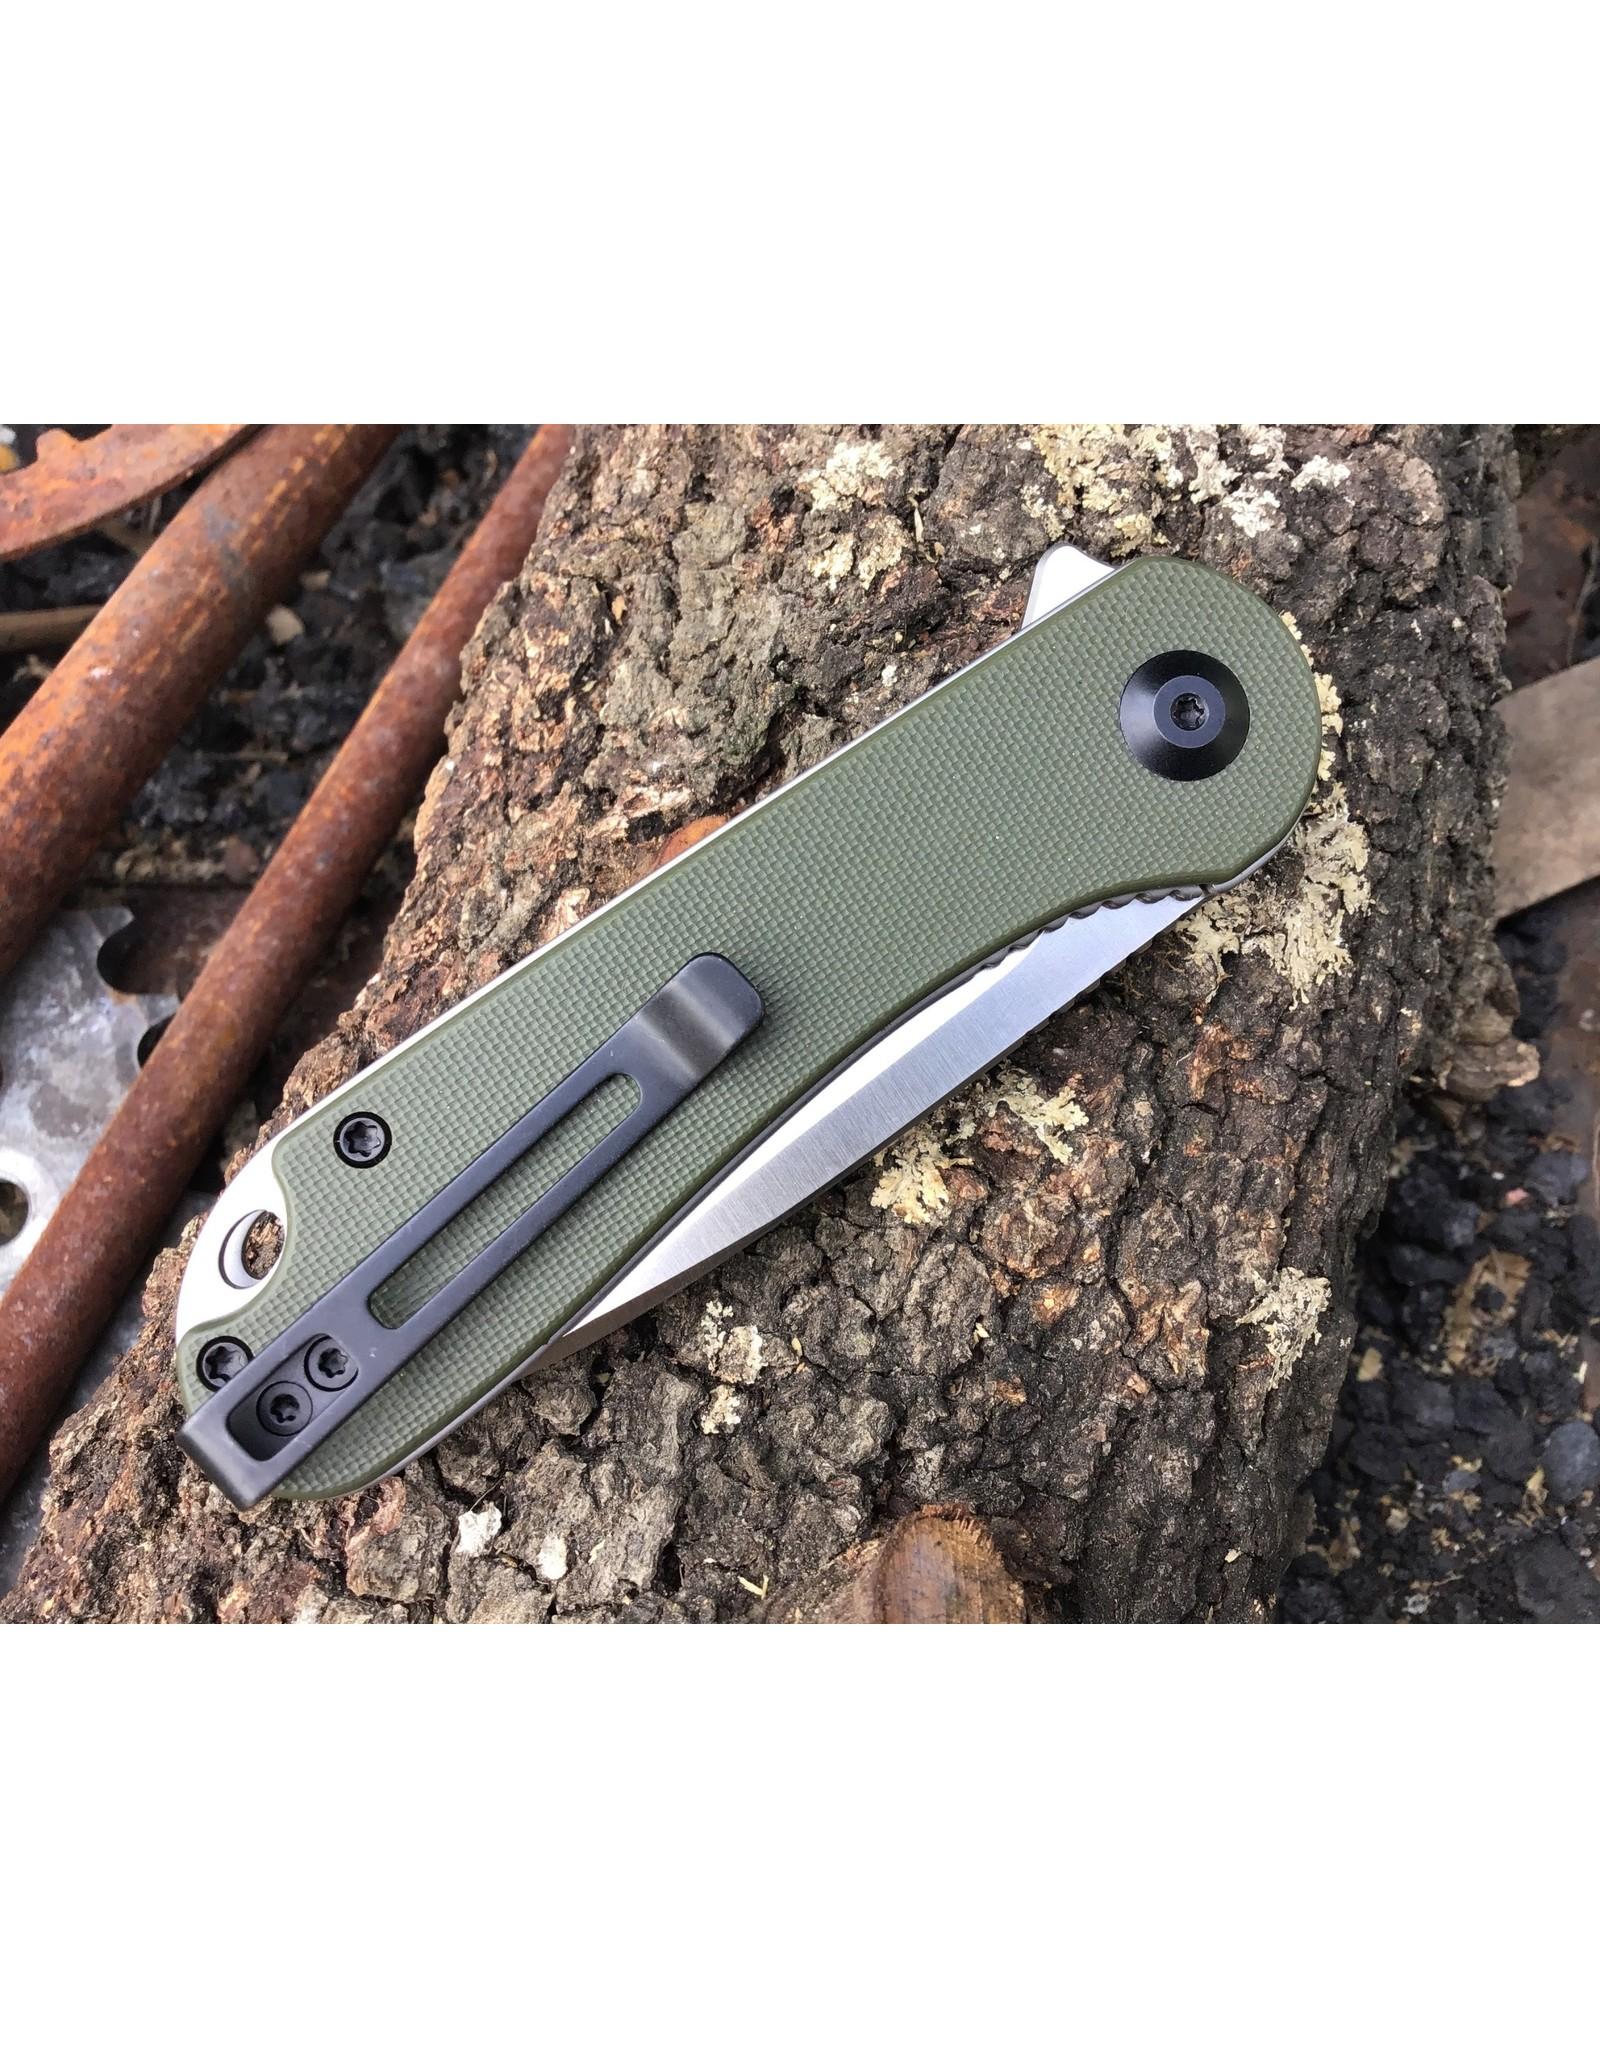 Civivi Elementum Green G-10